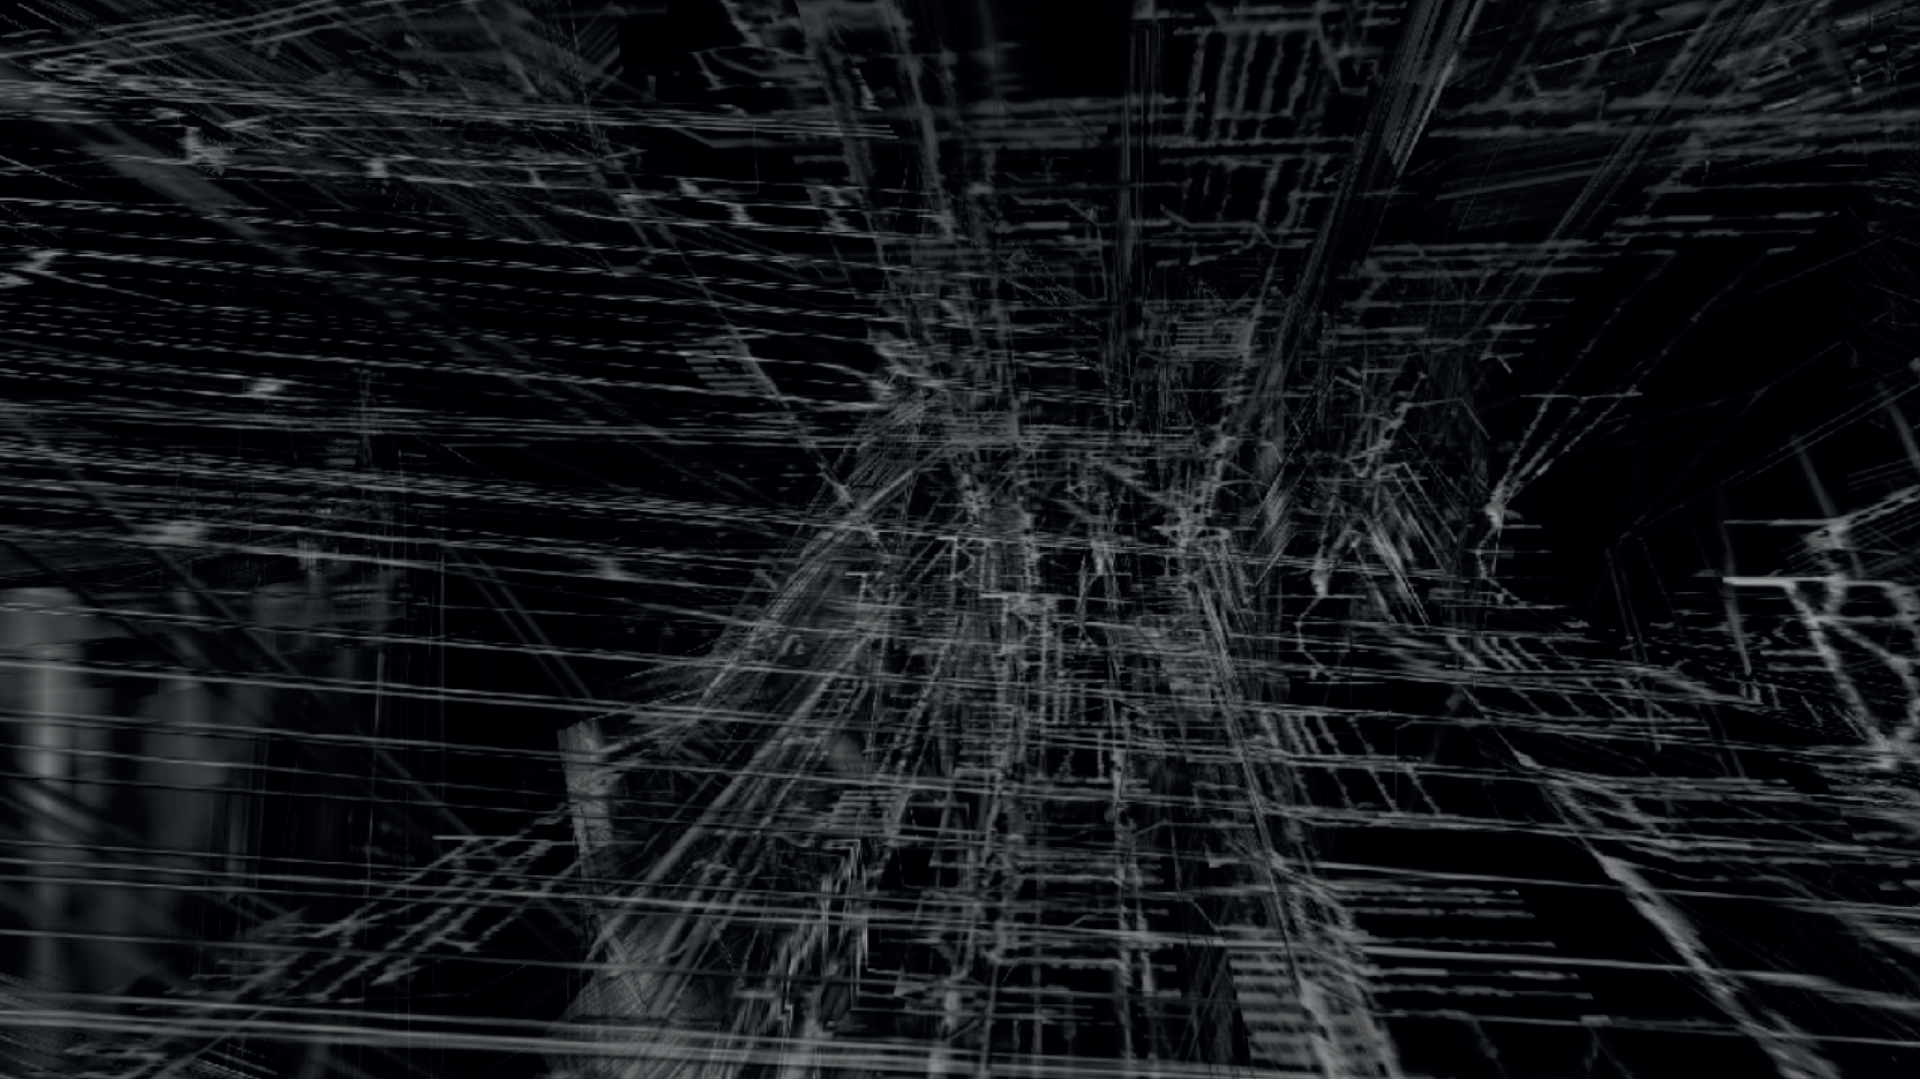 ©, Ken Byers, Interactive 3-D Grid